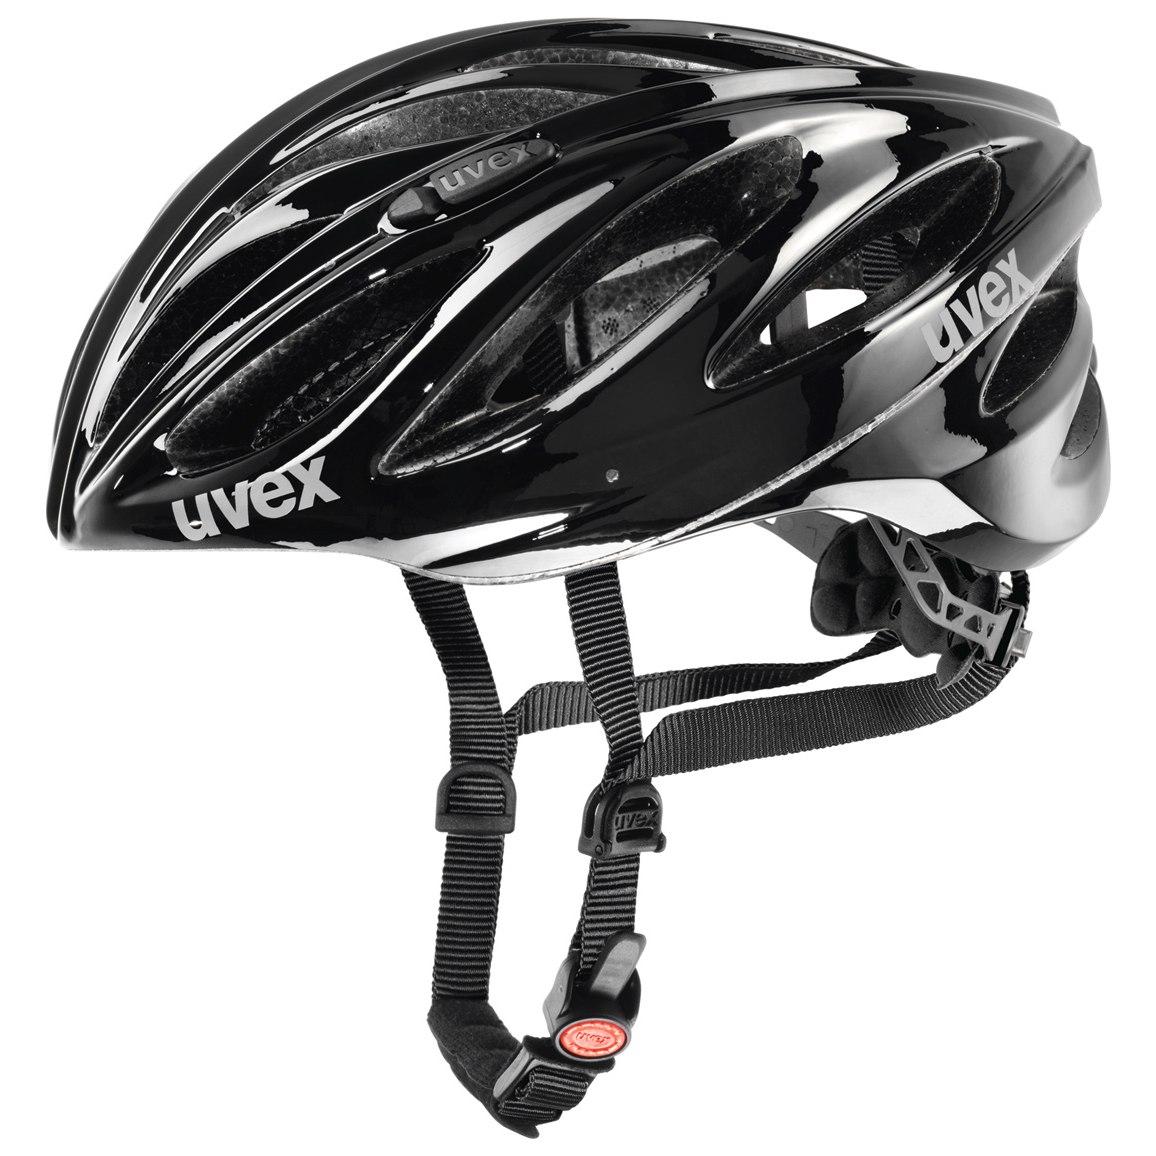 Uvex boss race Helmet - black